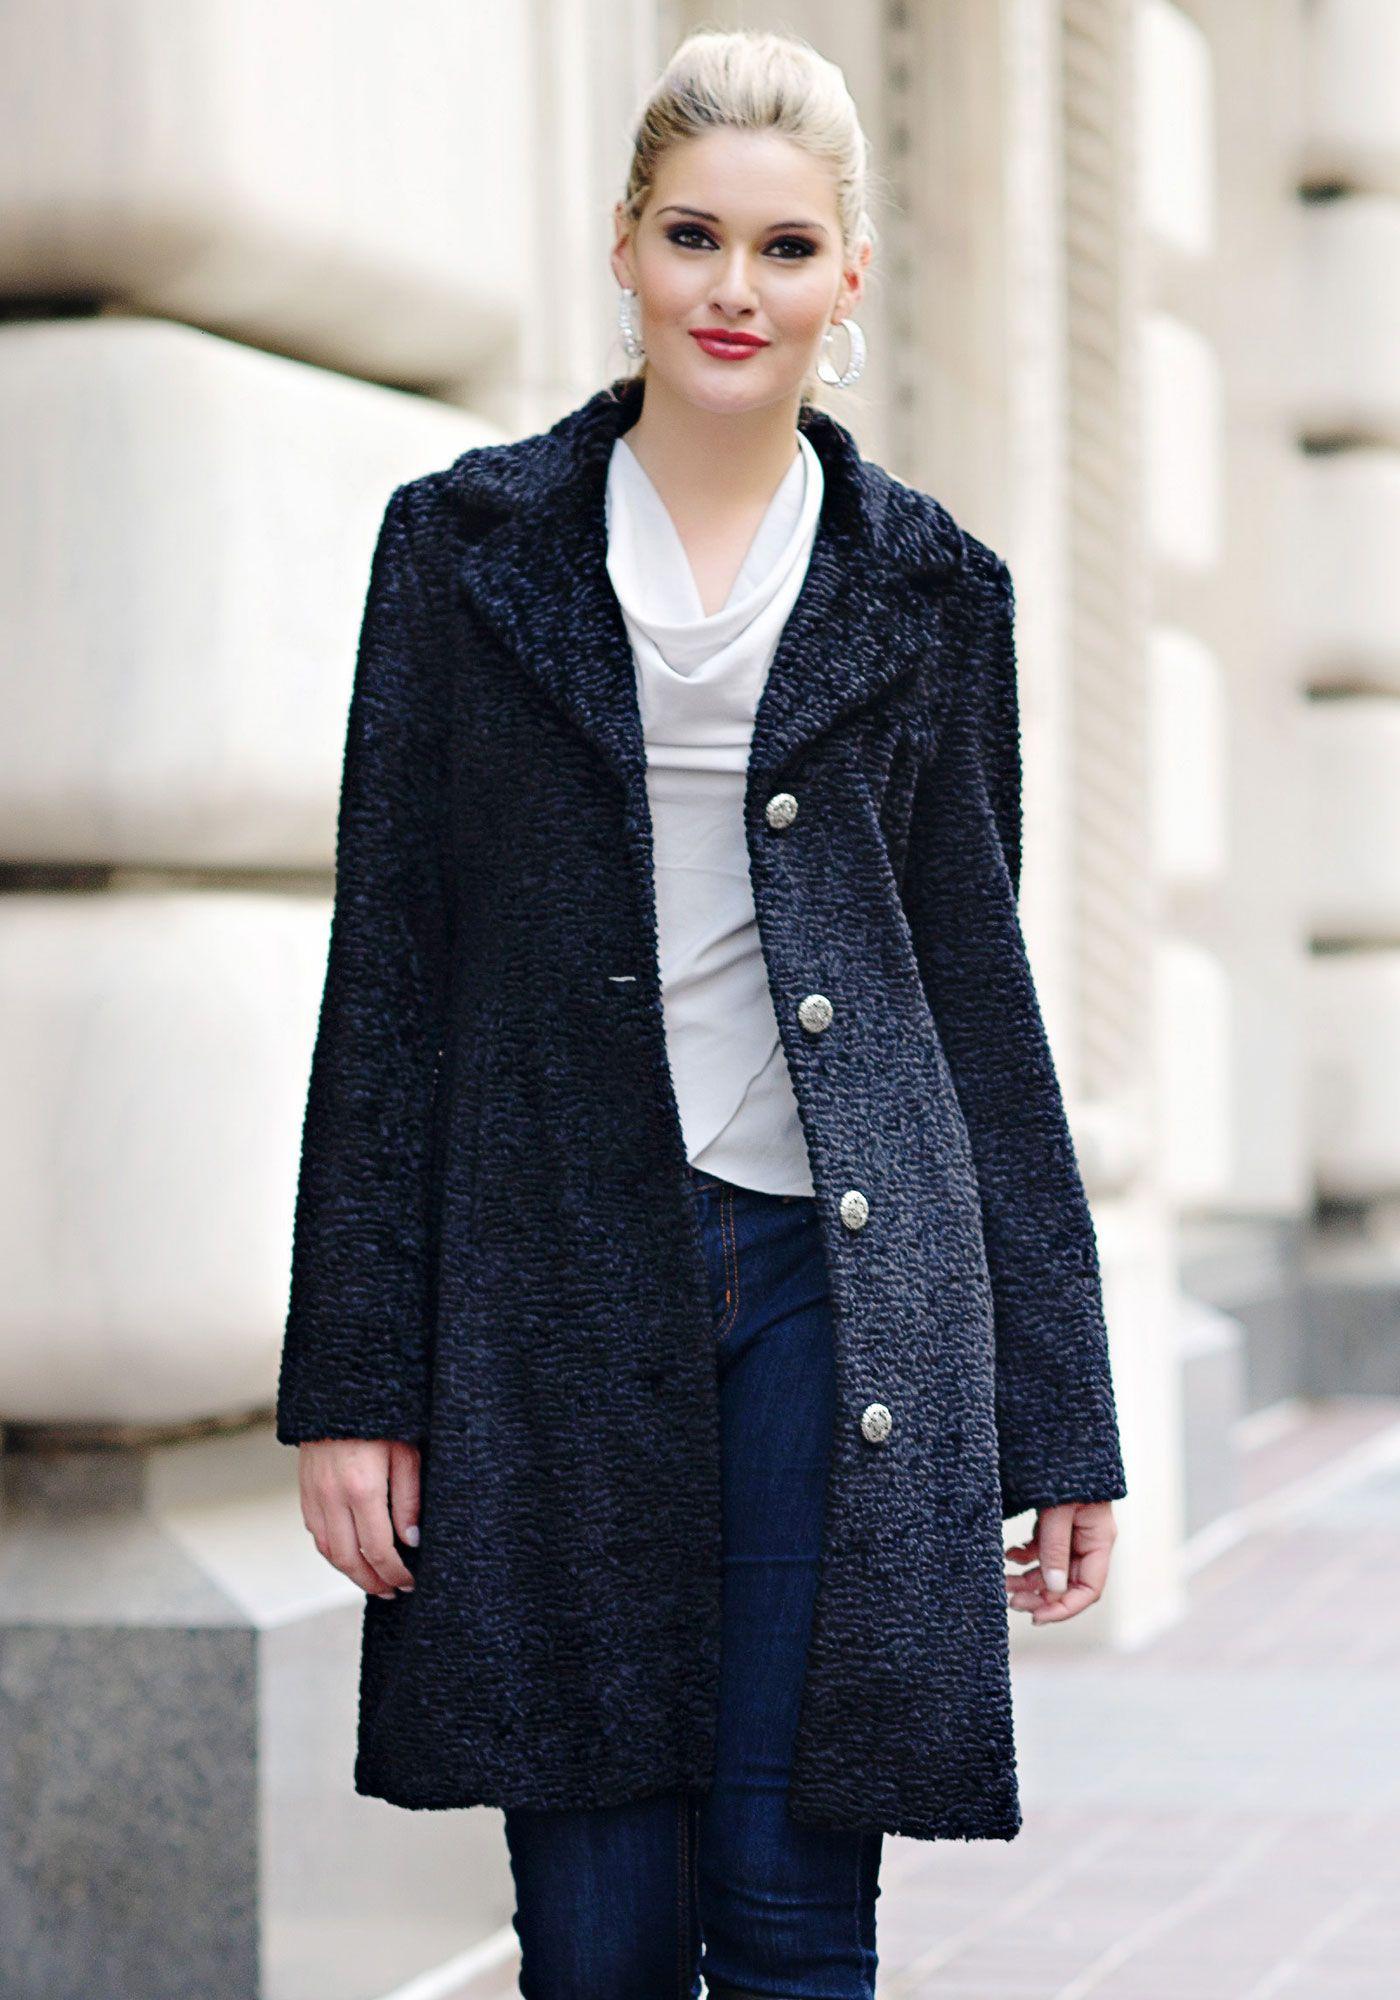 Gallery Notch Collar Faux Persian Lamb Fur Coat   Nordstrom $239